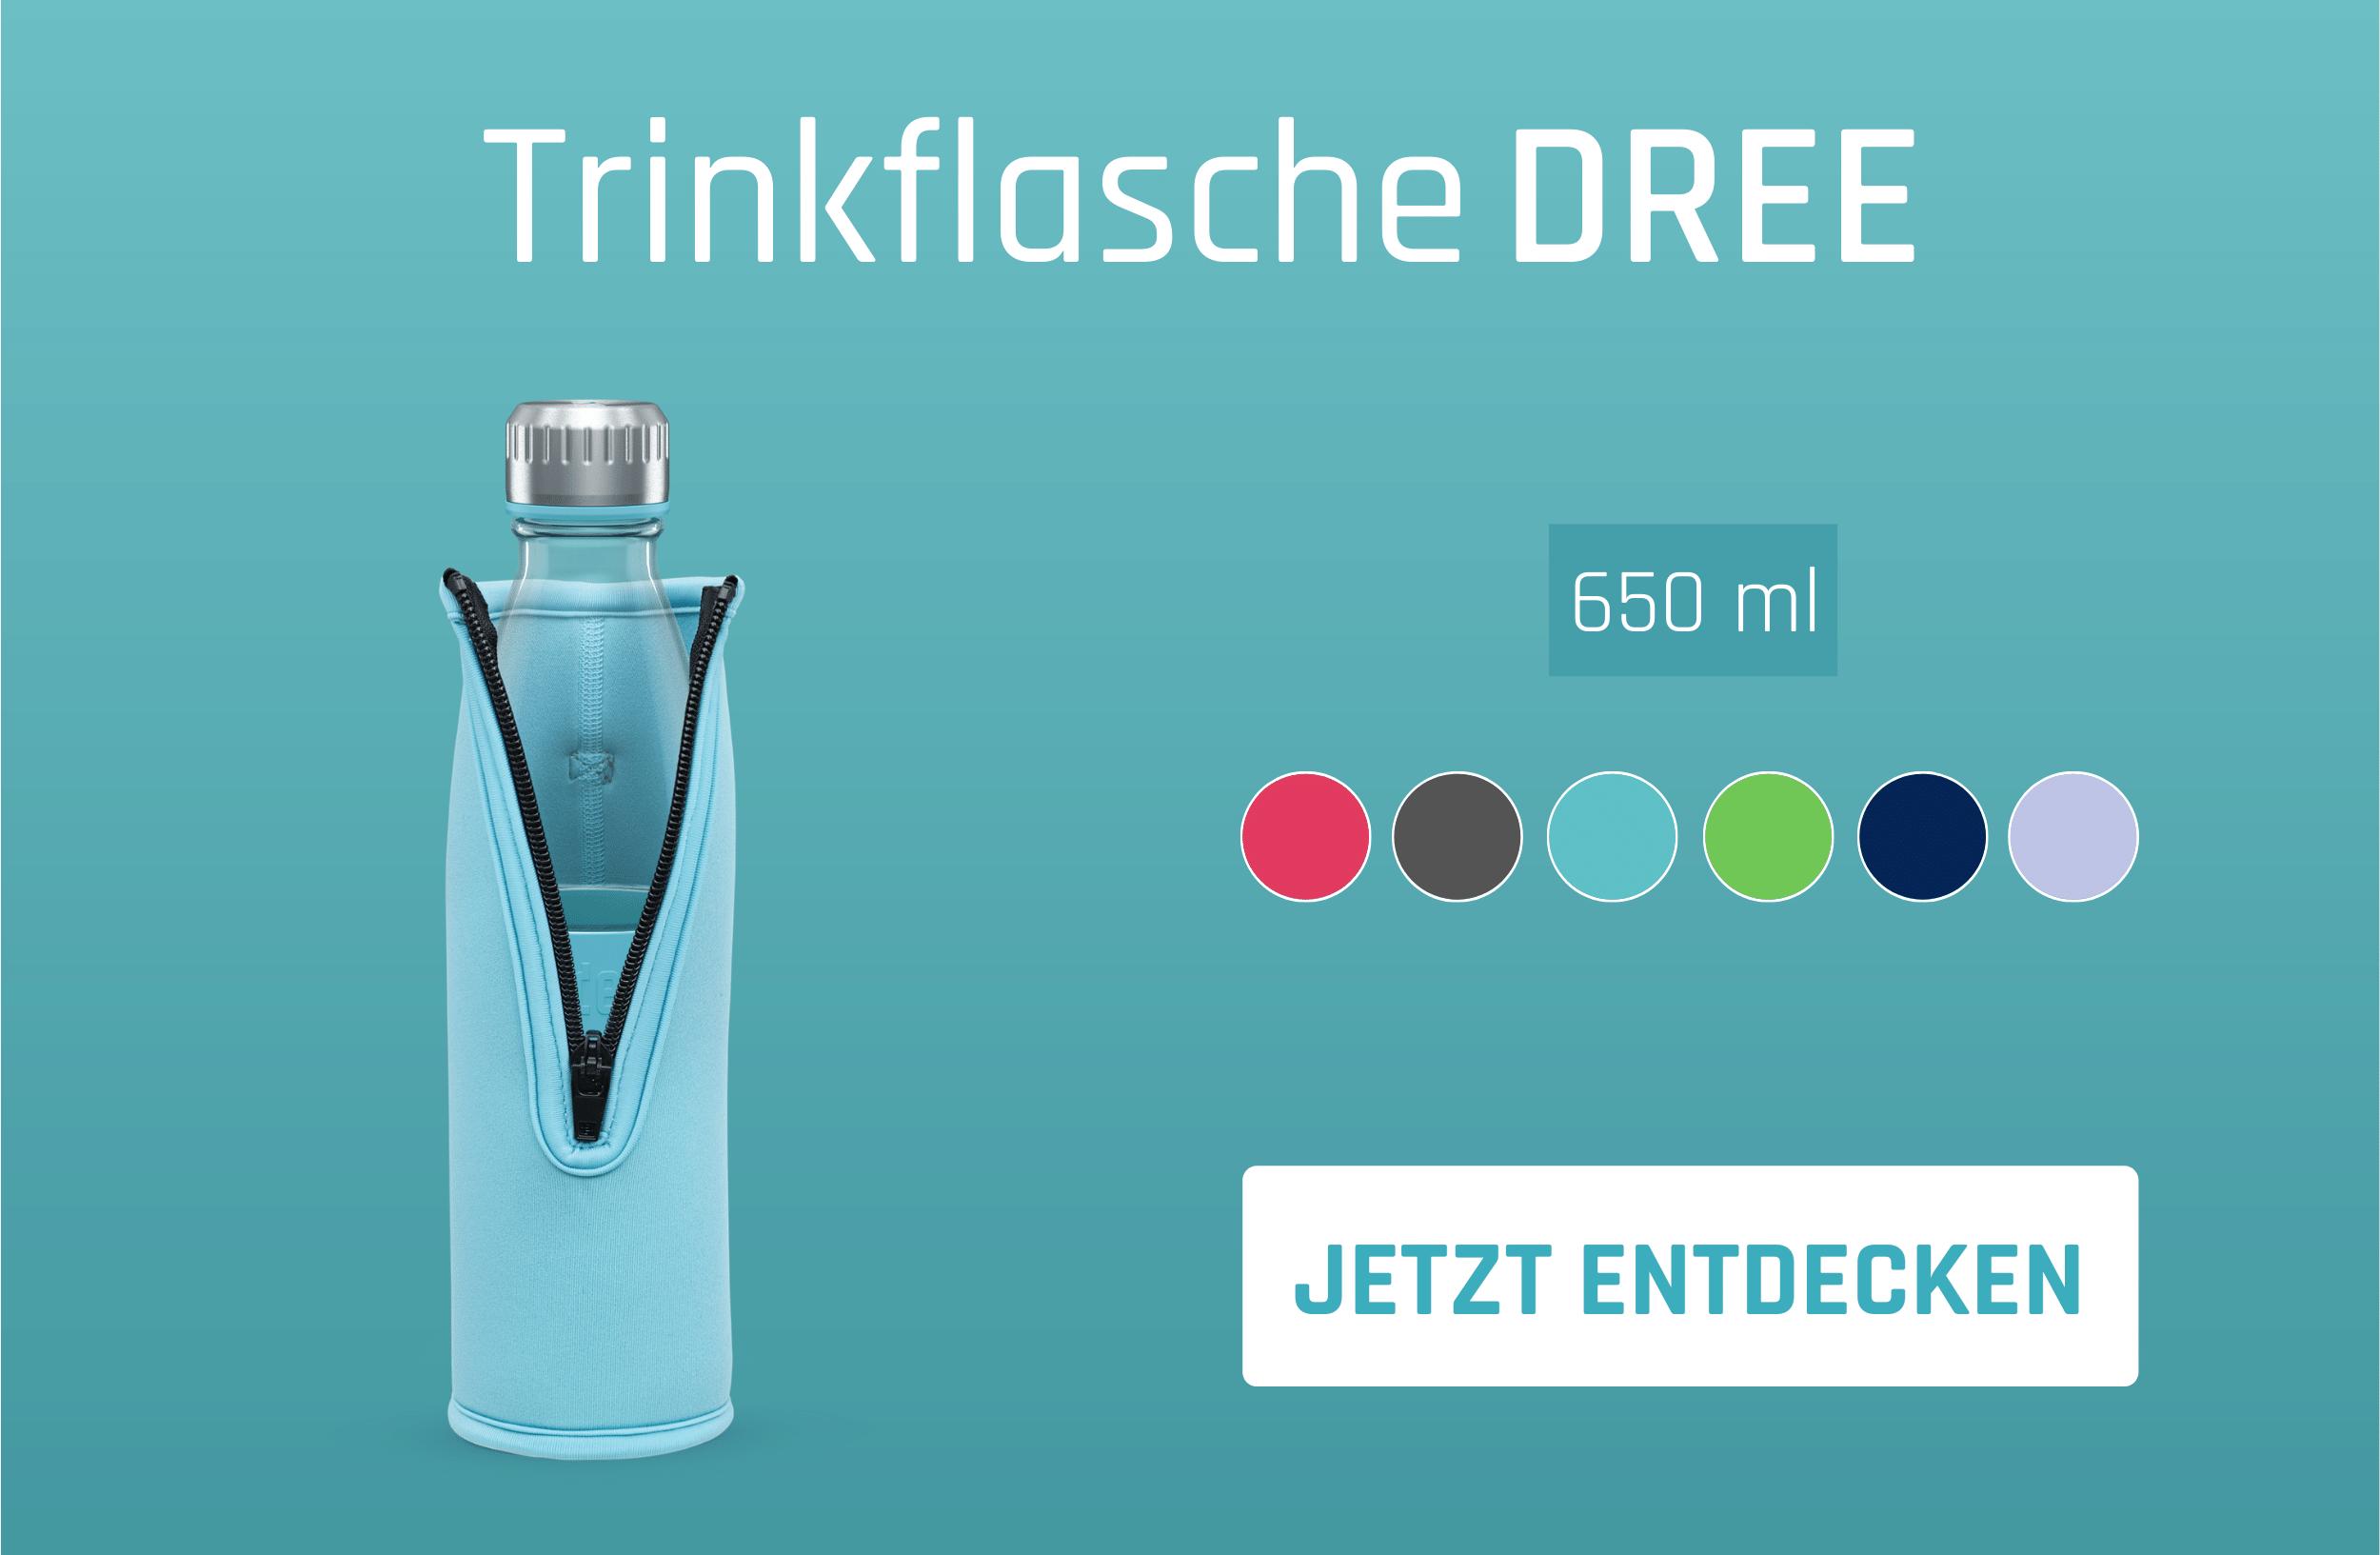 Trinkflasche DREE mit Neoprentasche PACKJE